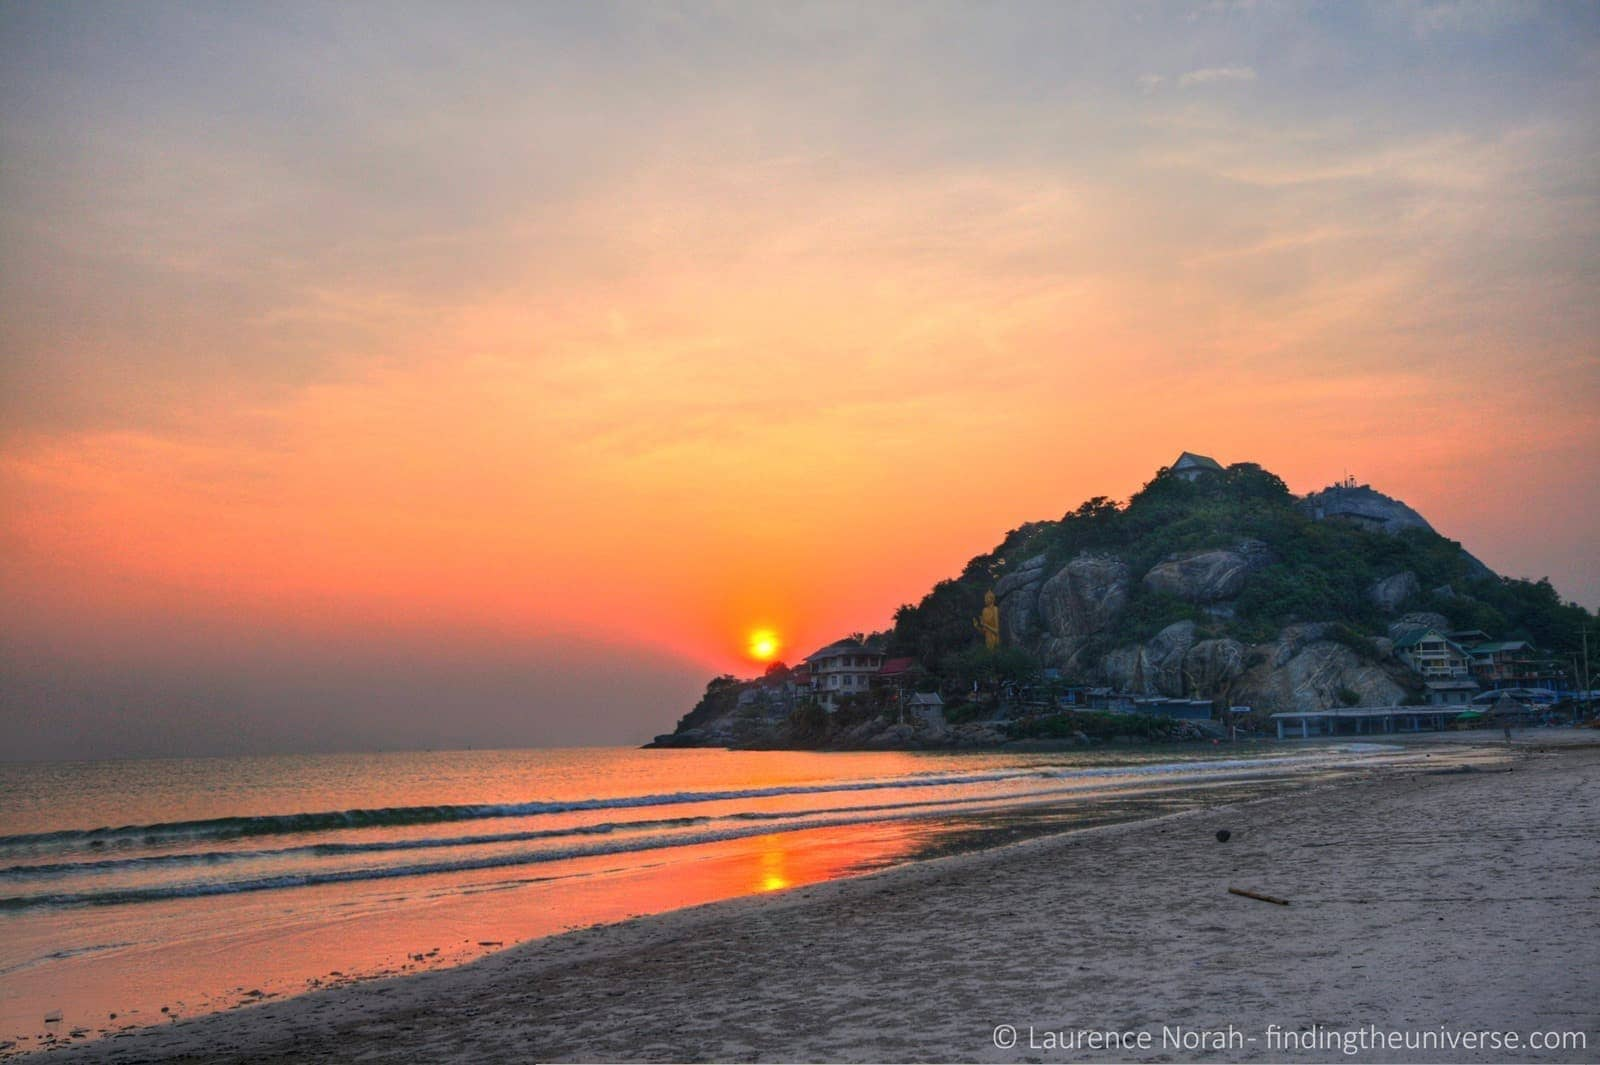 Sunrise from Nern Chalet Hua Hin beach